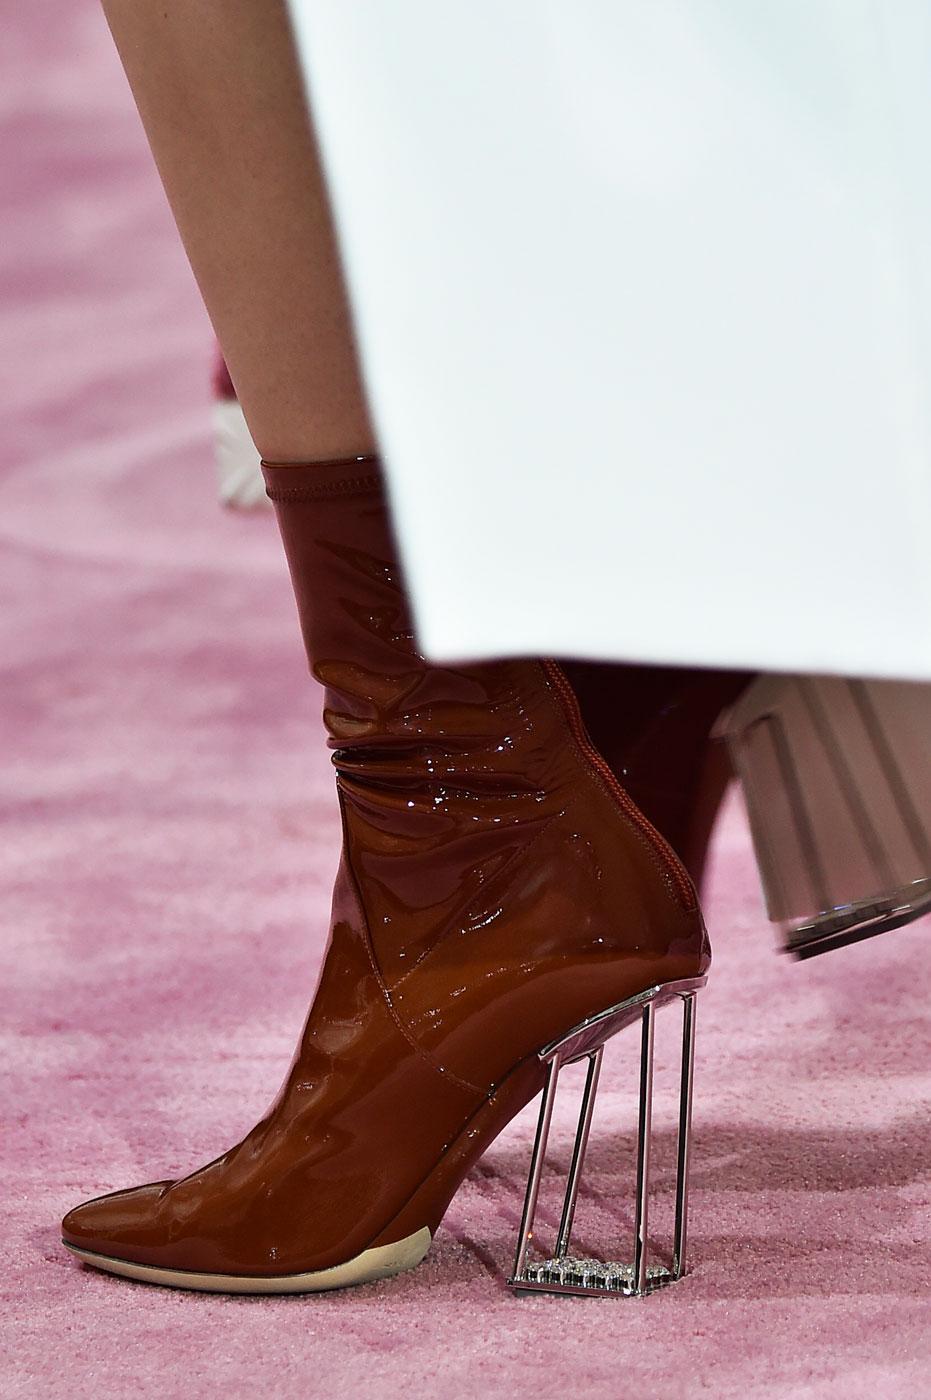 Christian-Dior-fashion-runway-show-close-ups-haute-couture-paris-spring-summer-2015-the-impression-117